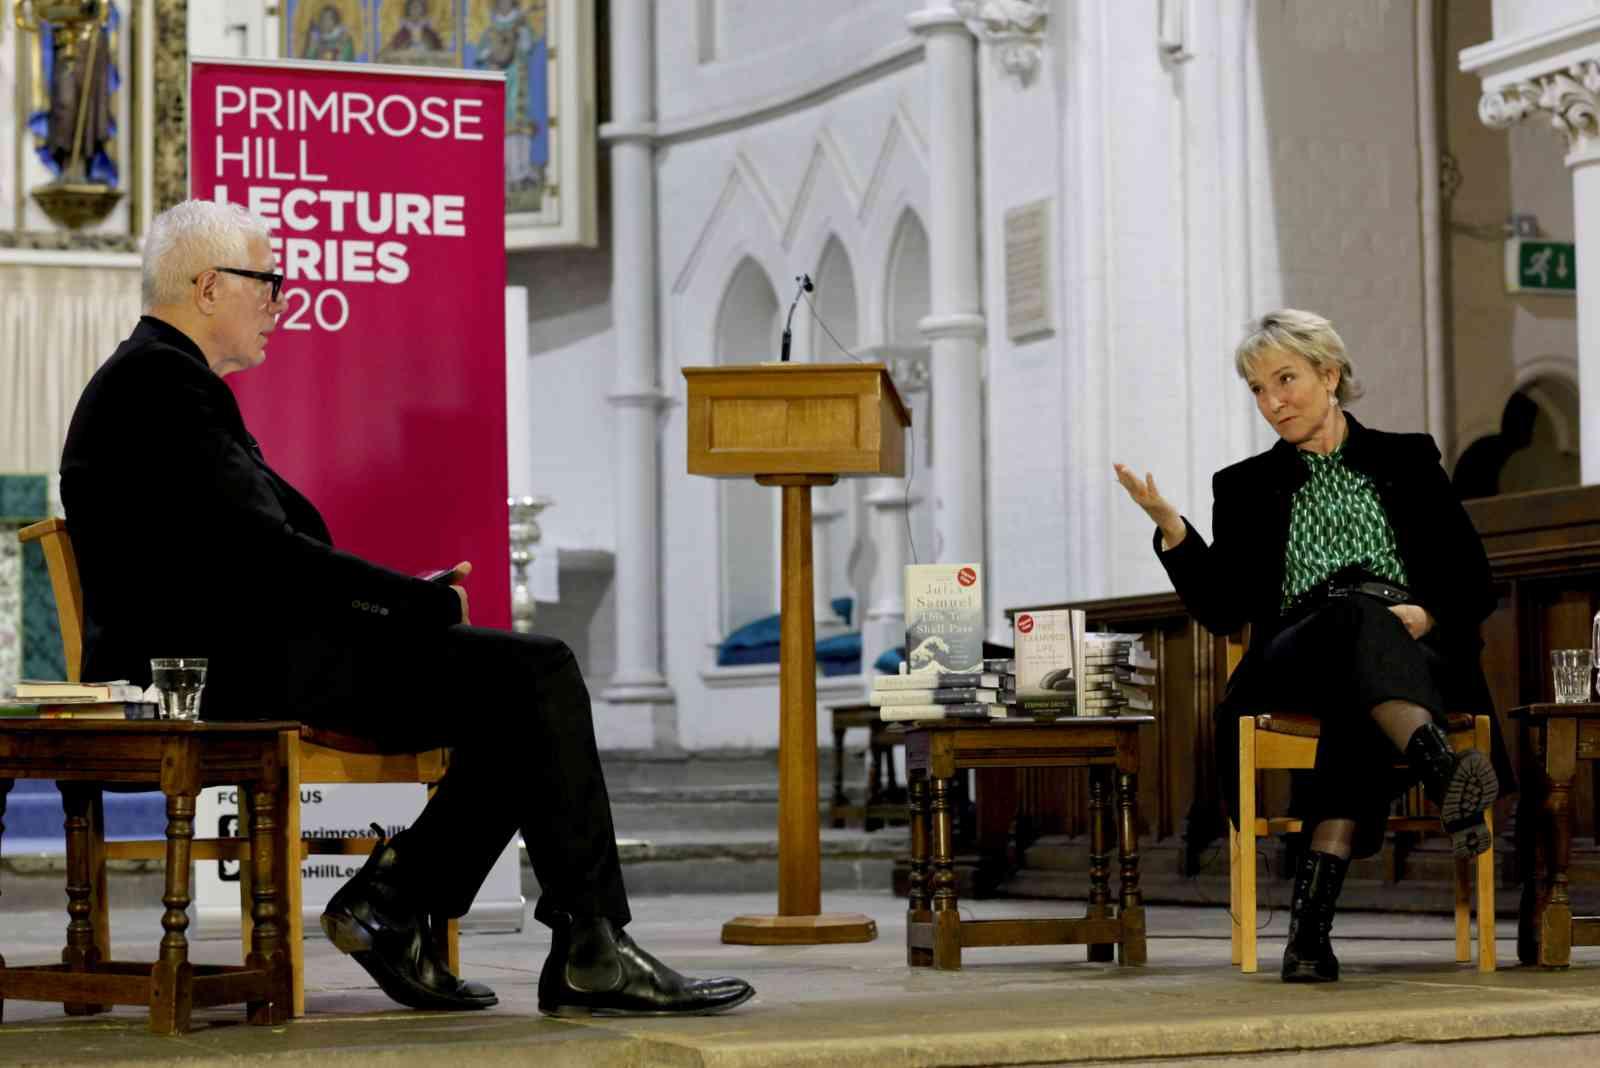 Primrose Hill Lectures